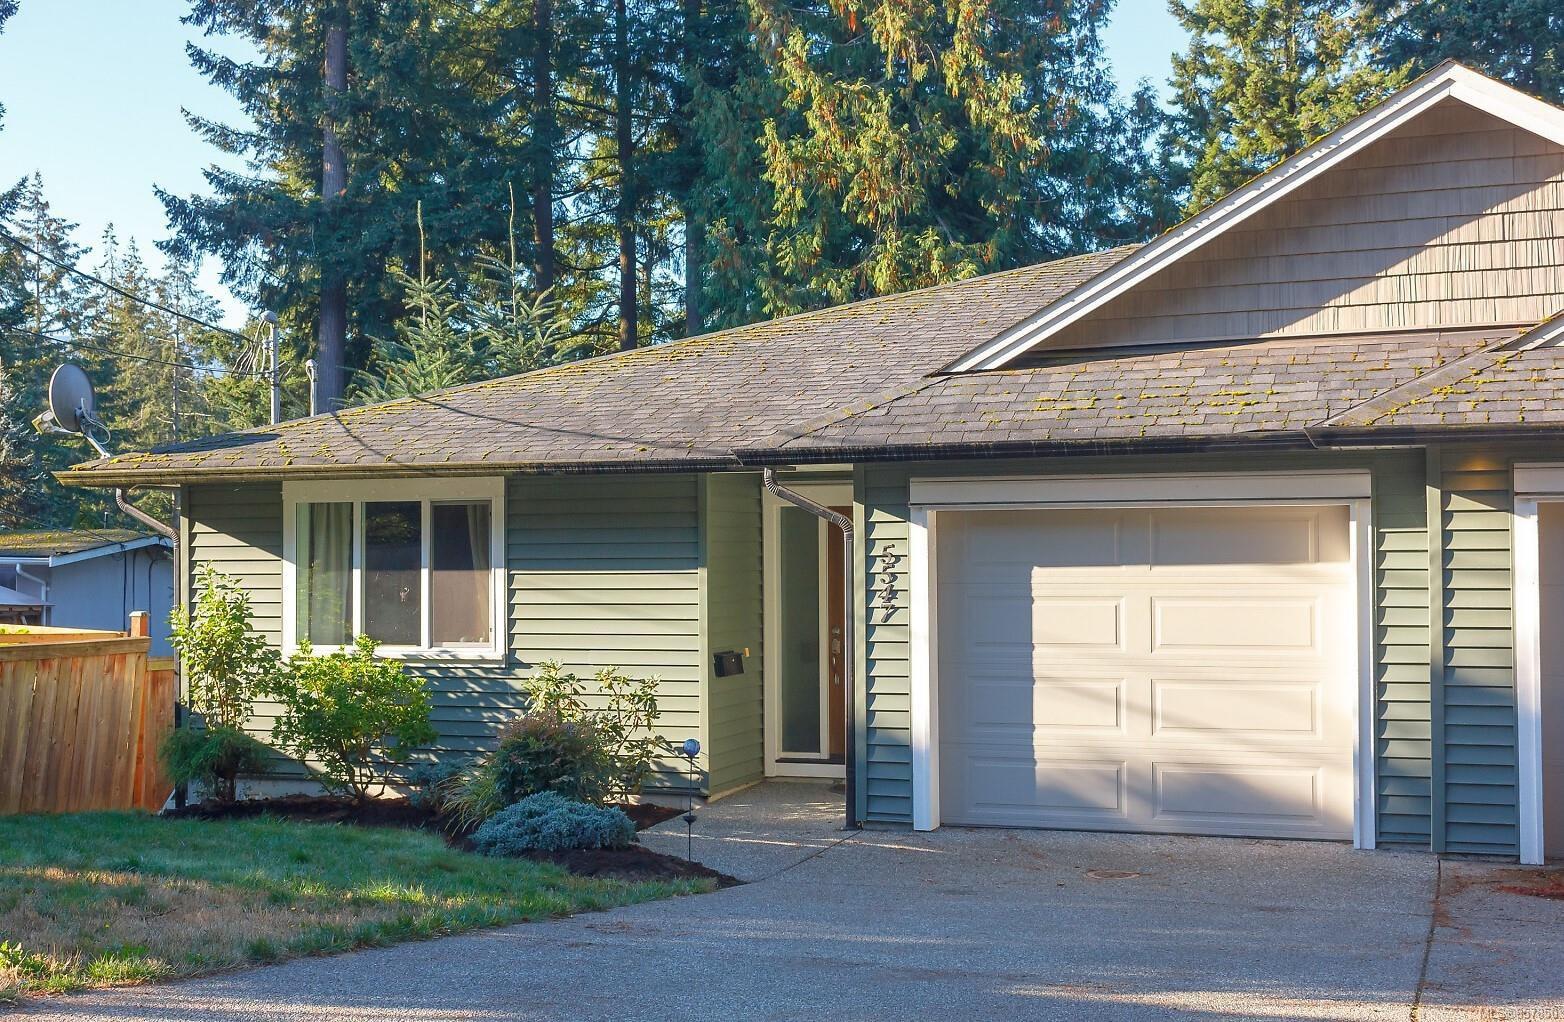 Main Photo: 5547 Big Bear Ridge in : Na Pleasant Valley Half Duplex for sale (Nanaimo)  : MLS®# 857850